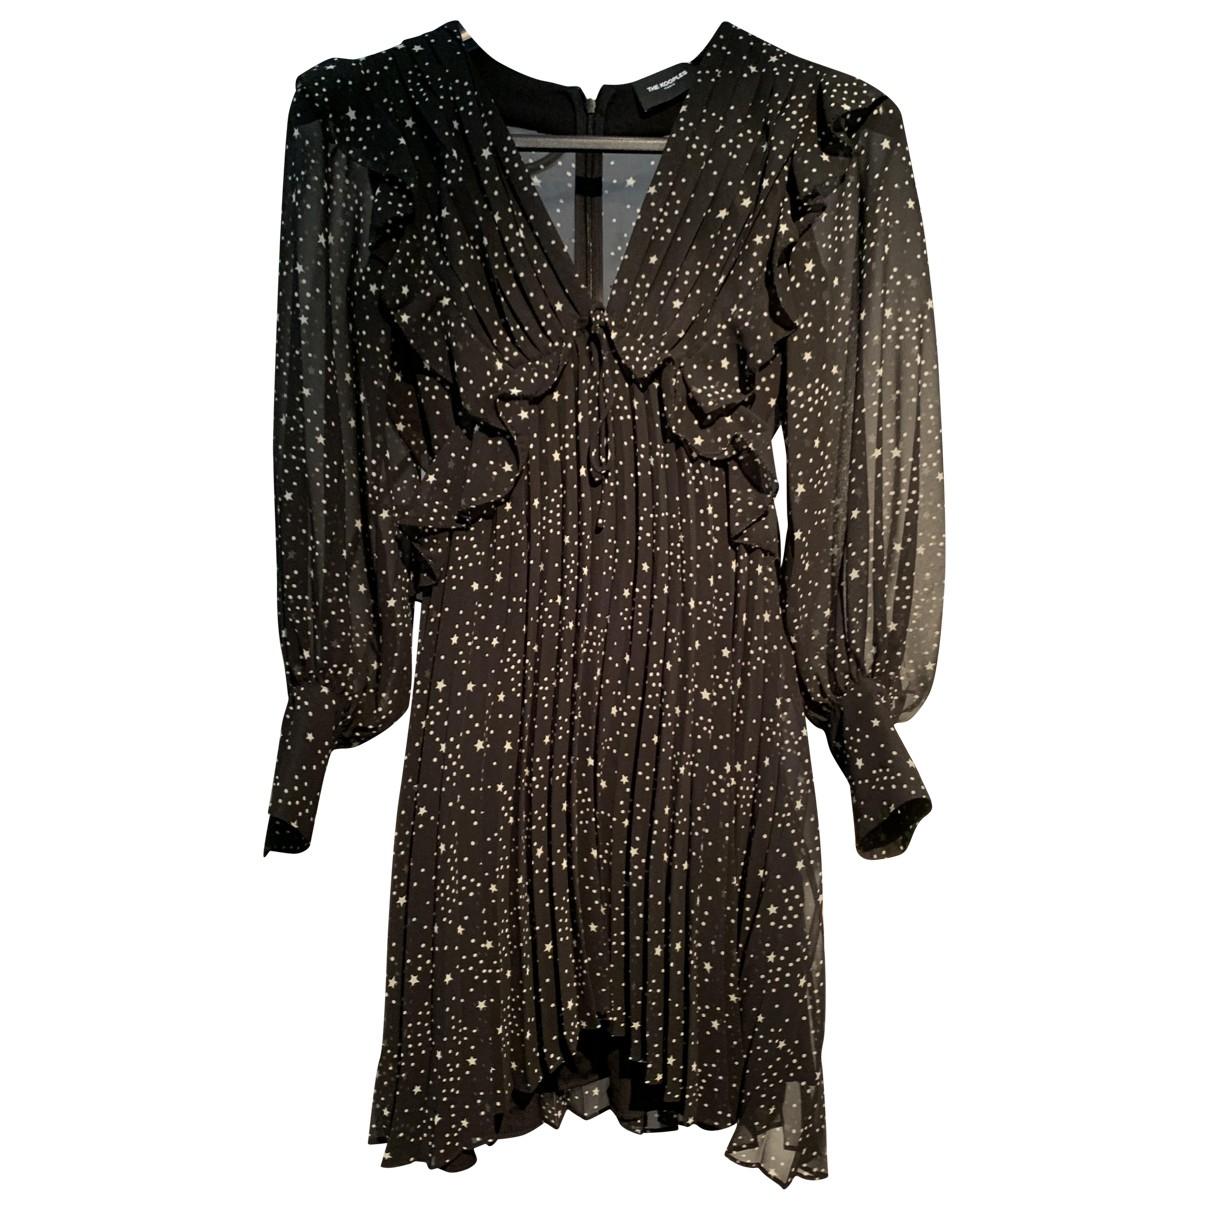 The Kooples \N Black dress for Women 0 0-5